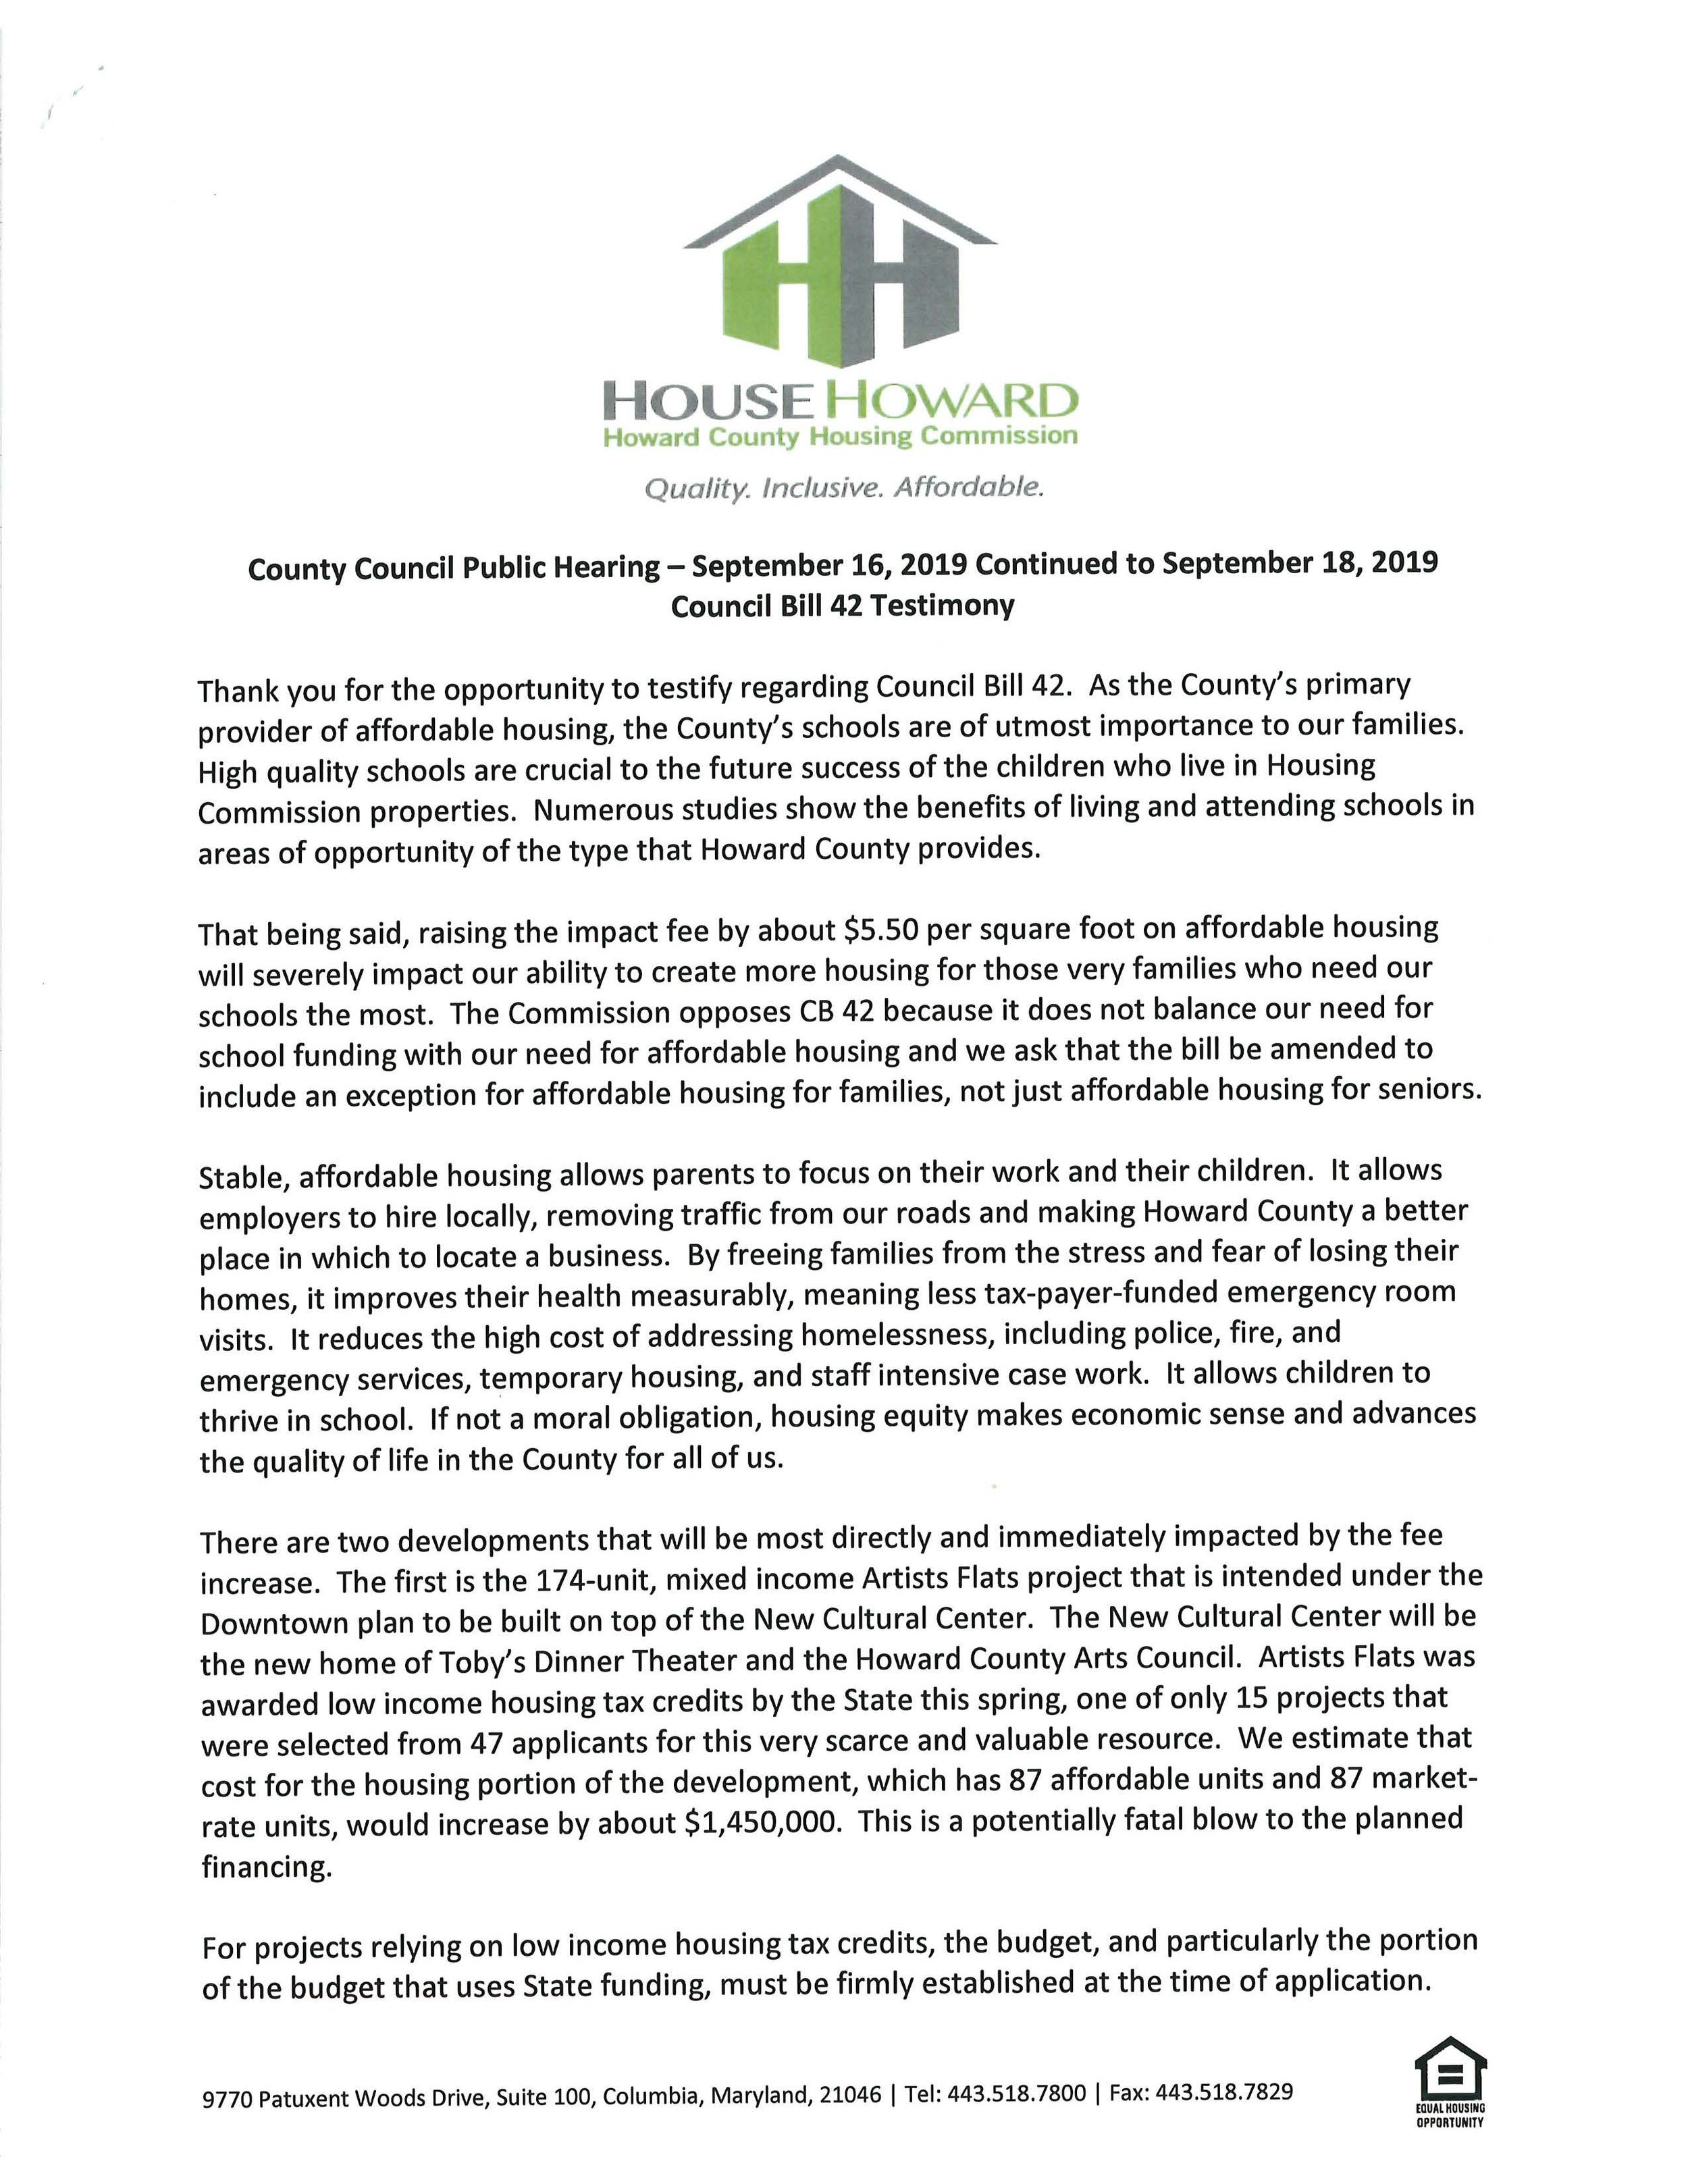 Howard County Housing Commission.jpg